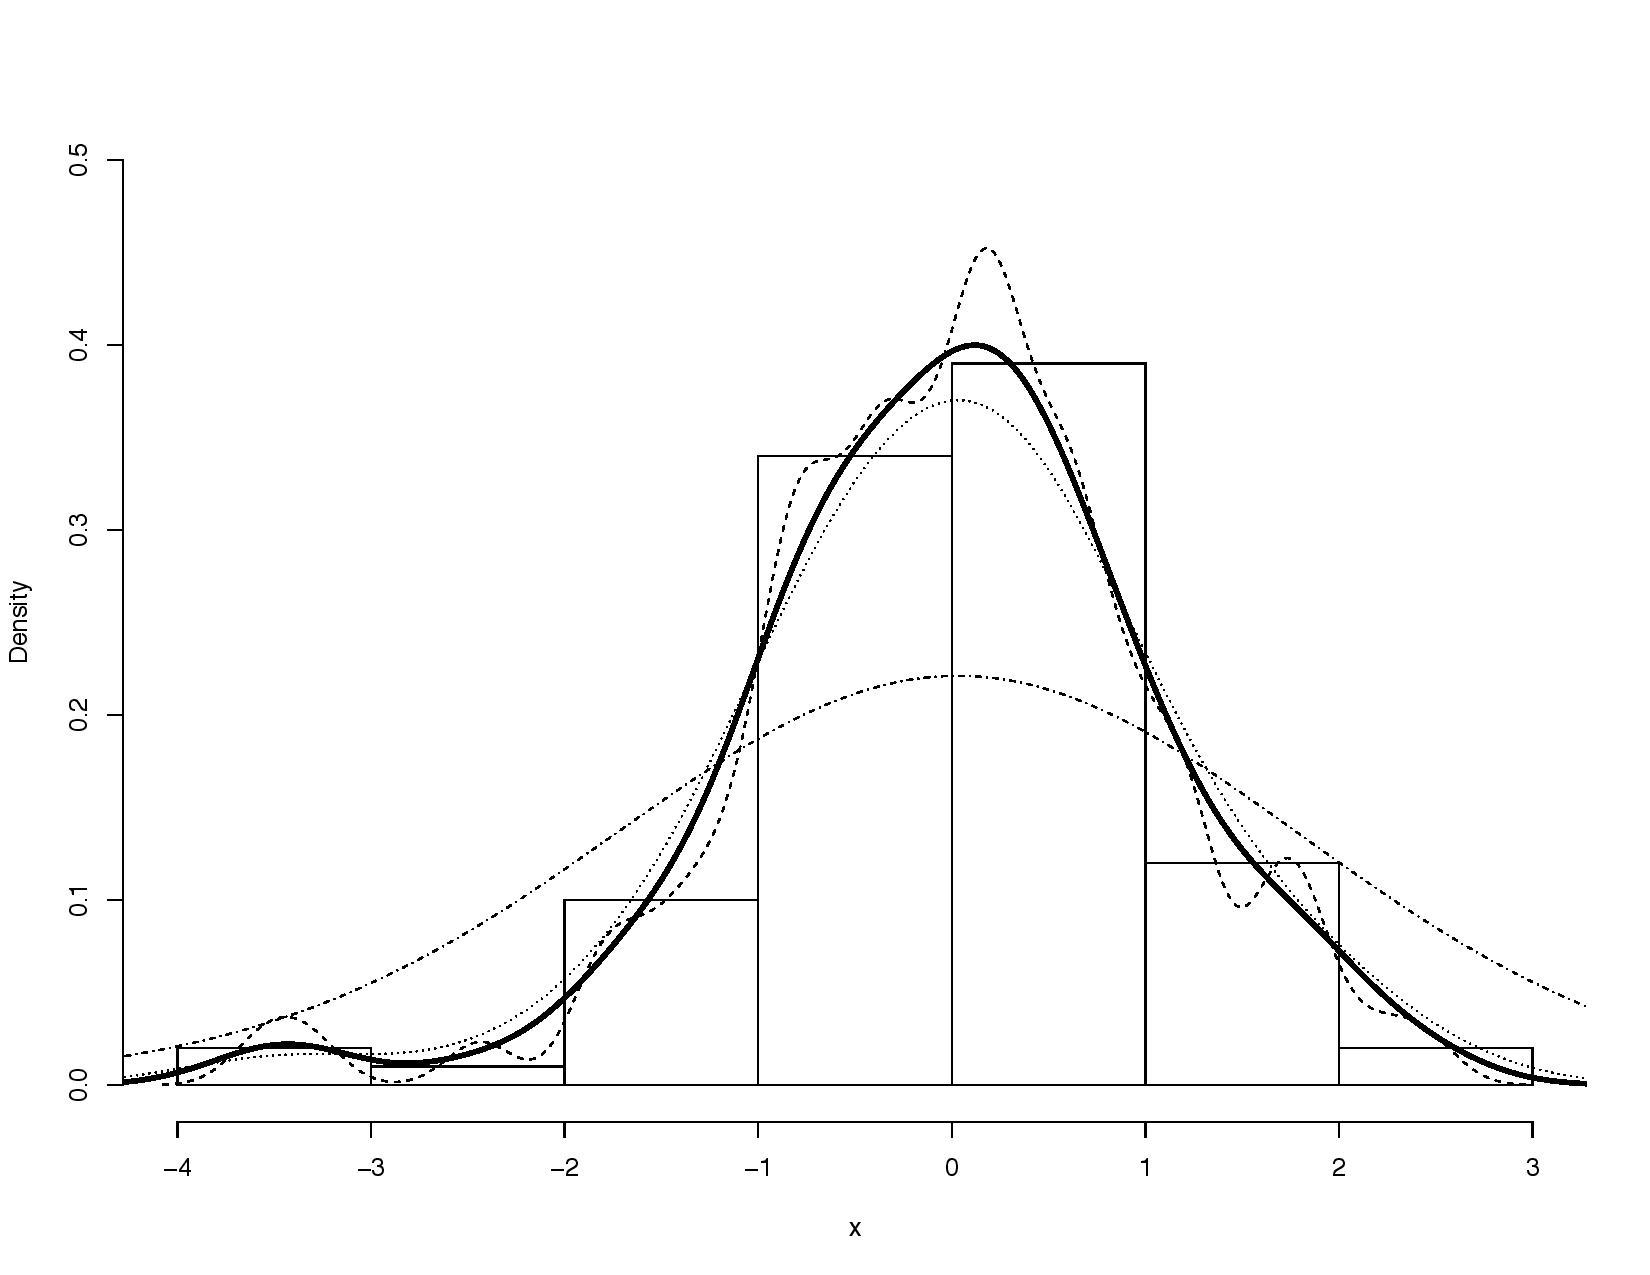 Kernel density estimates for various bandwidths.